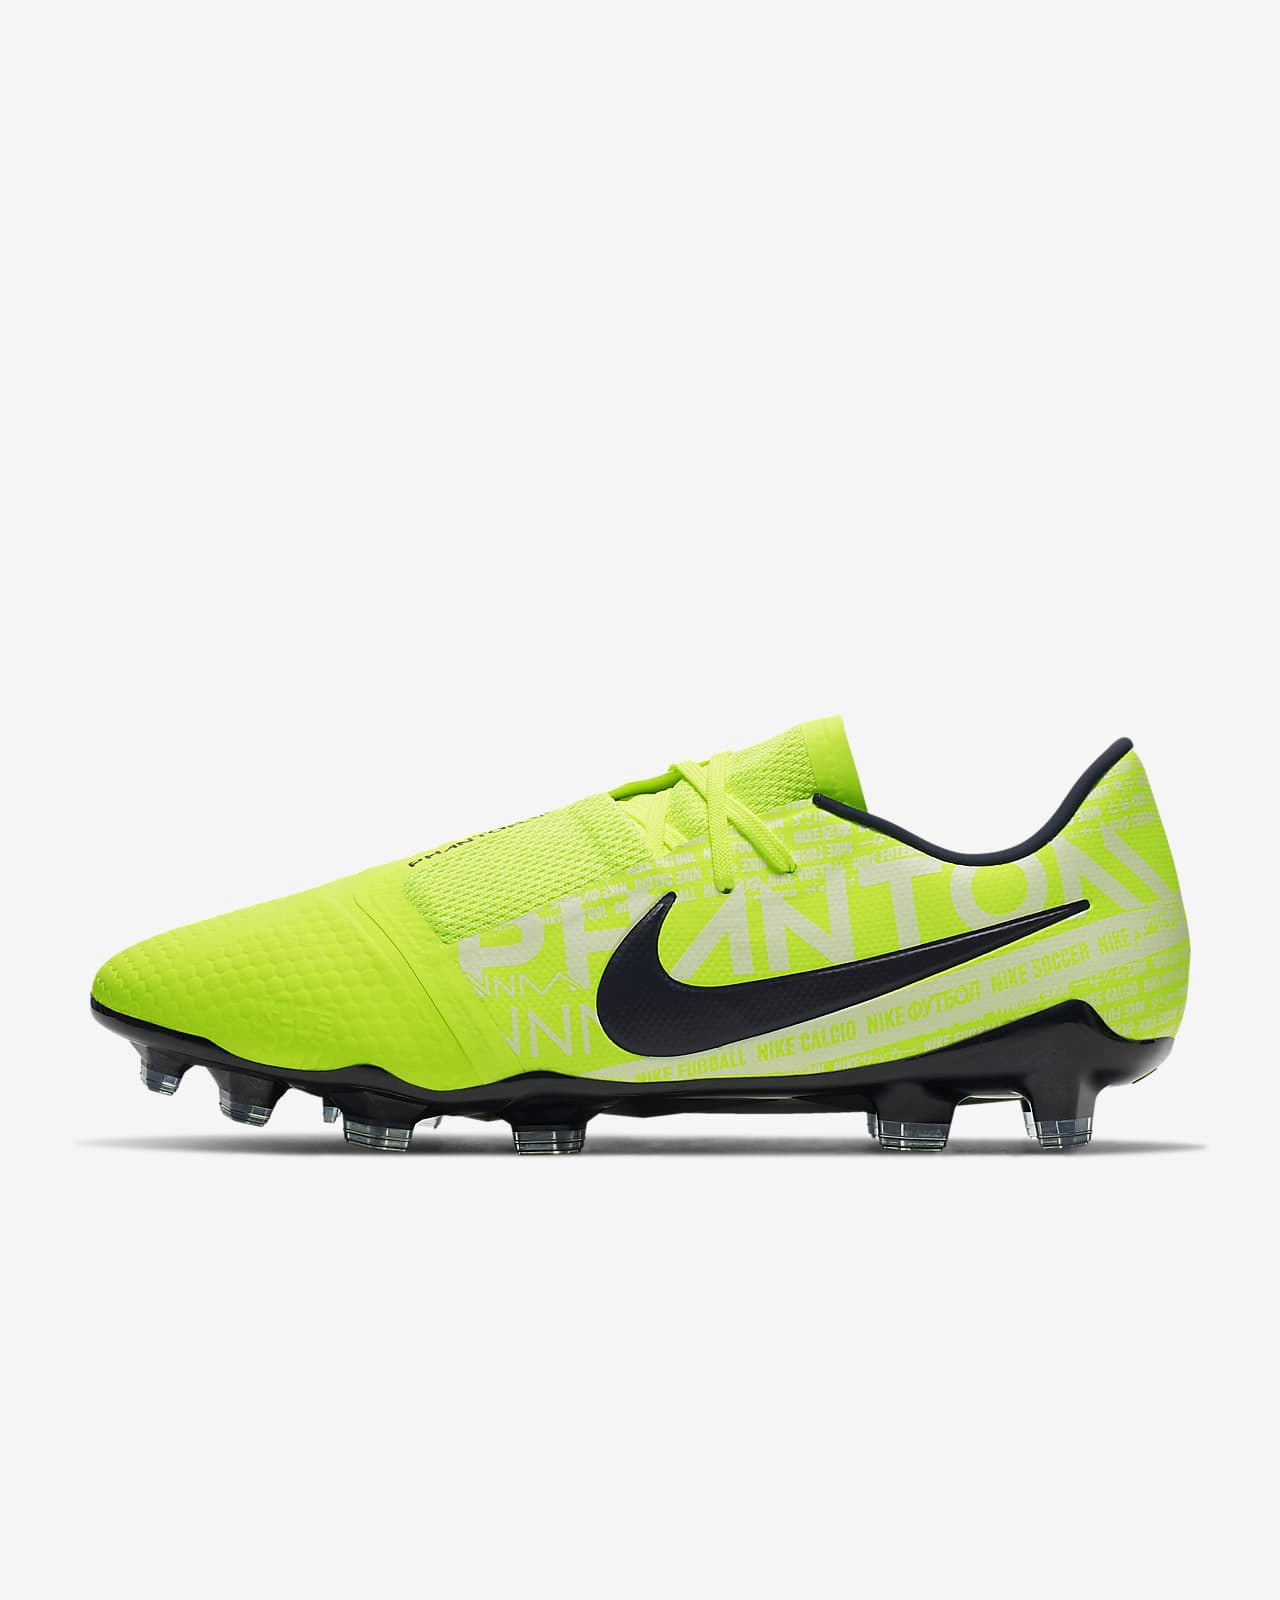 Desmantelar Tiempos antiguos expandir  Nike Phantom Venom Pro FG Firm-Ground Football Boot. Nike ZA